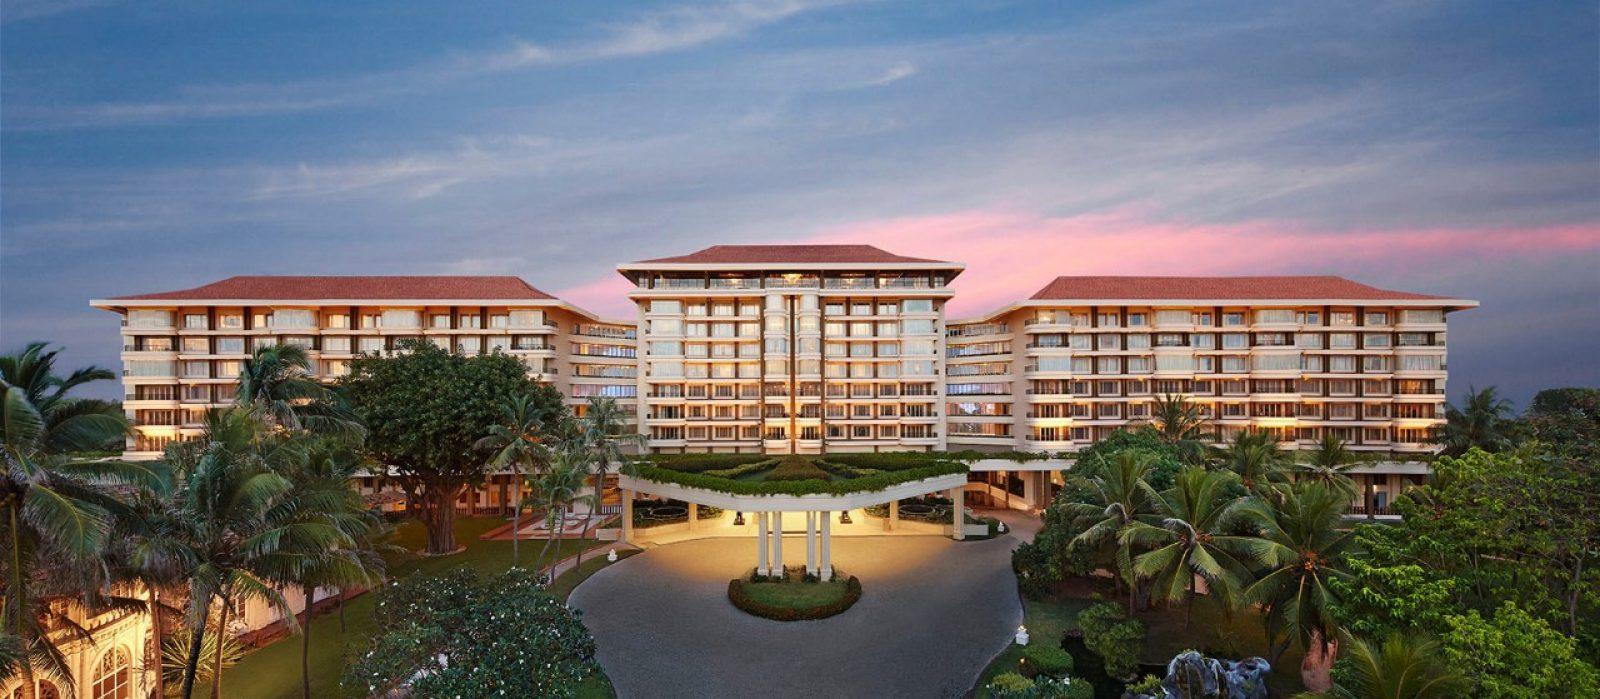 Hotel Taj Samudra official conference venue partners tiikm